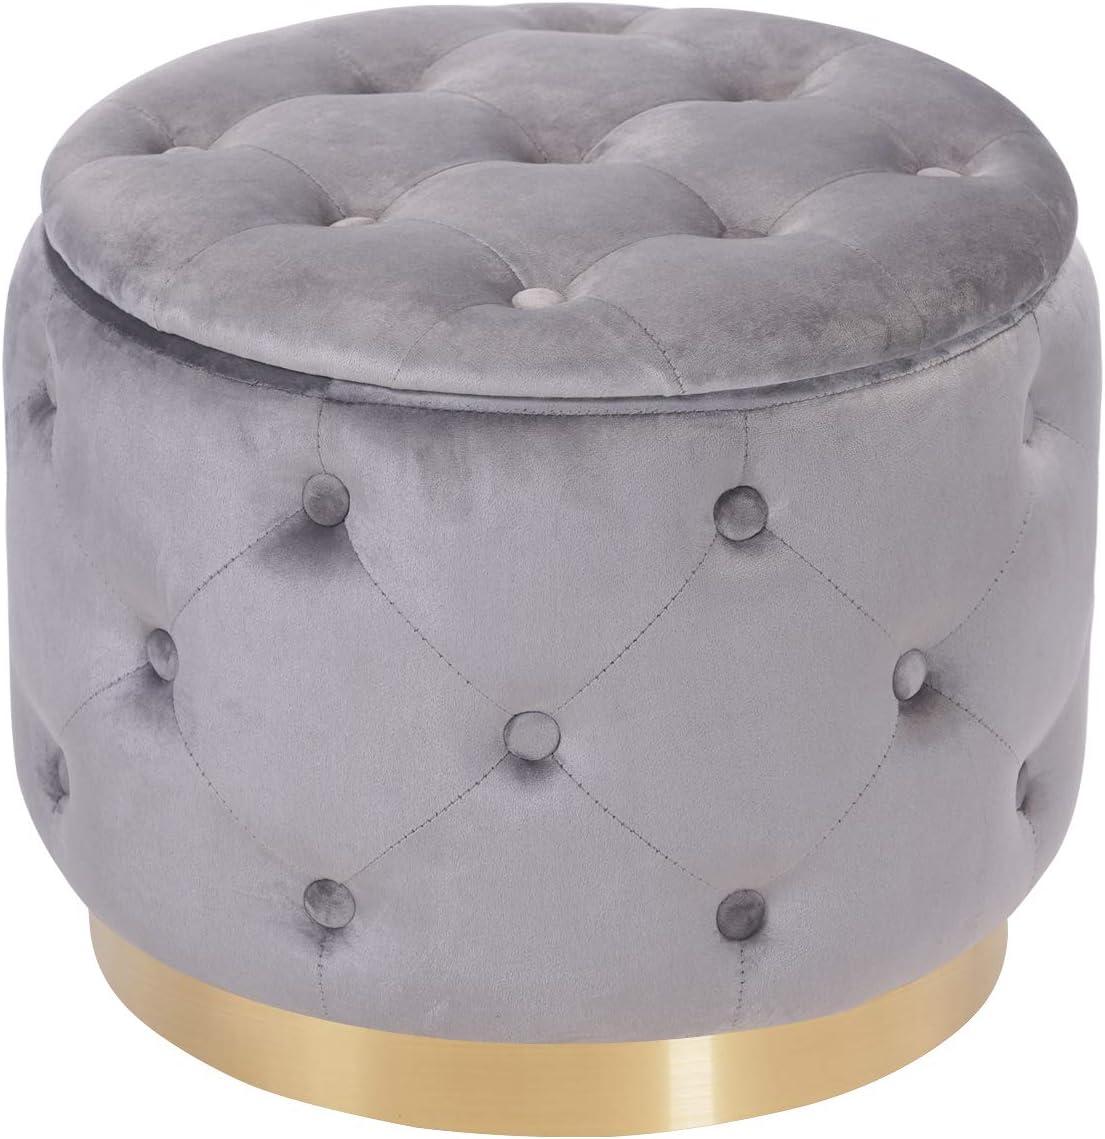 DEERUN Modern Industry No. 1 Velvet Tufted Year-end annual account Button Round Storage Ott Upholstered